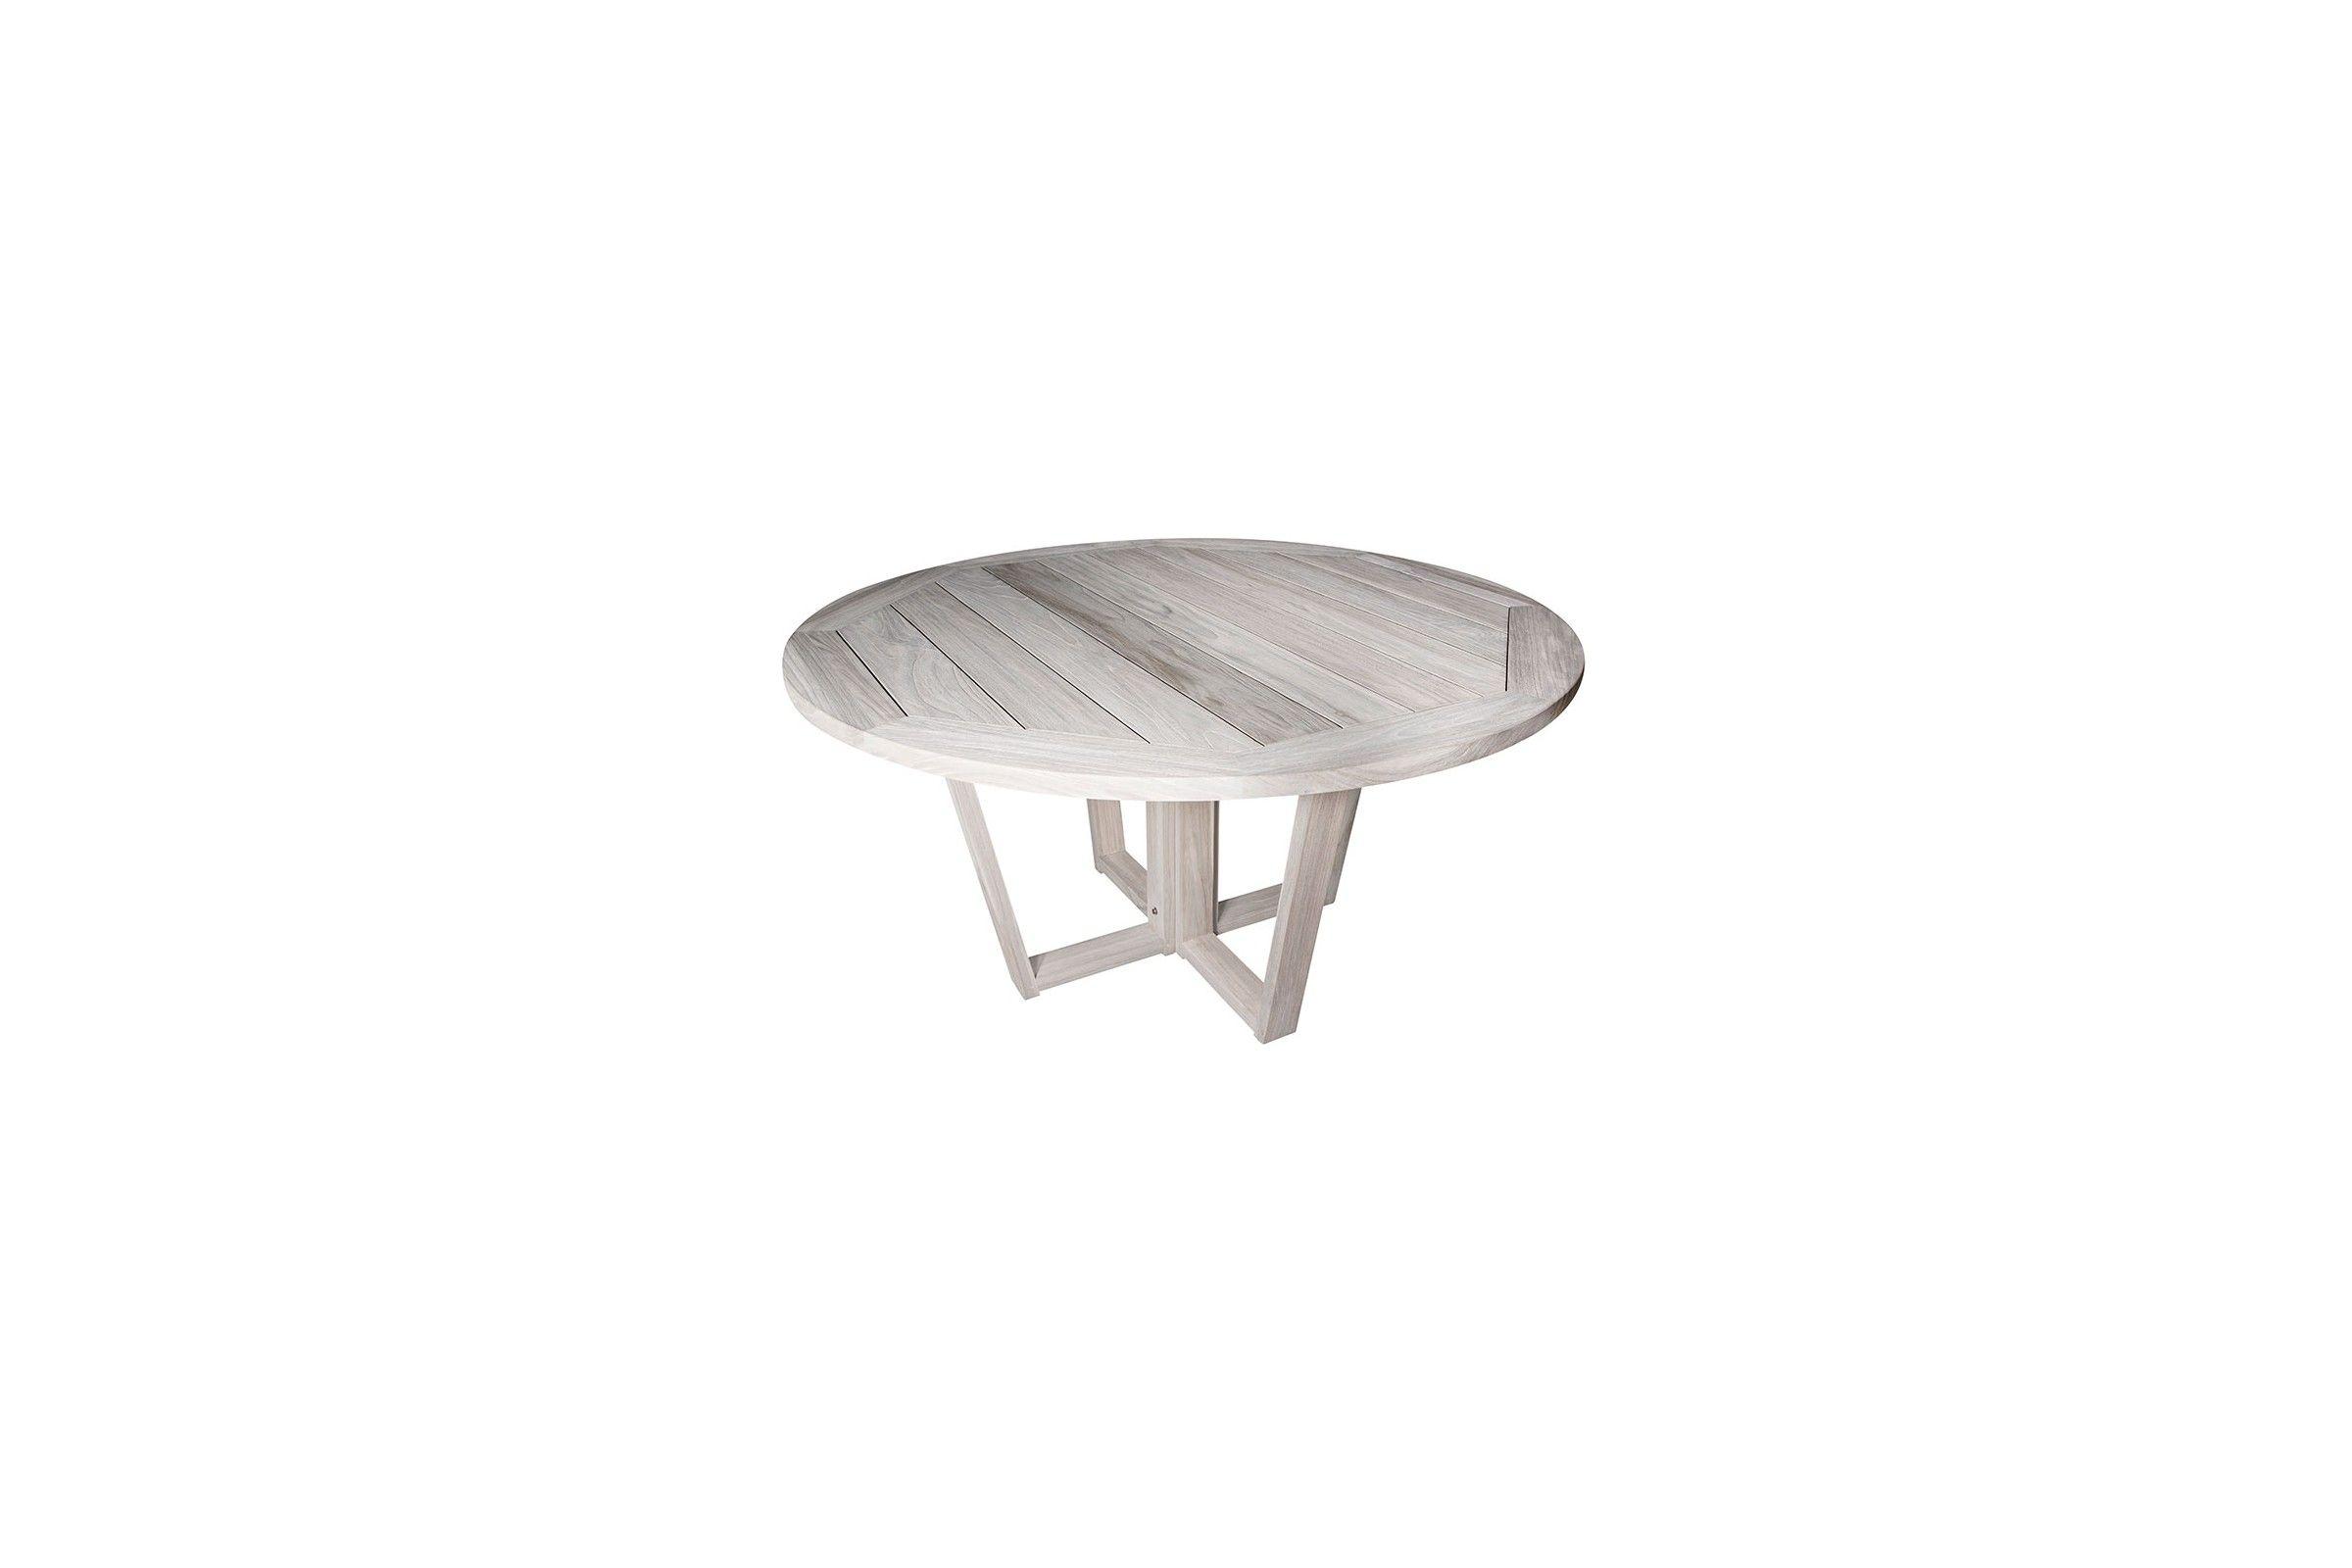 diametre table ronde maison design. Black Bedroom Furniture Sets. Home Design Ideas